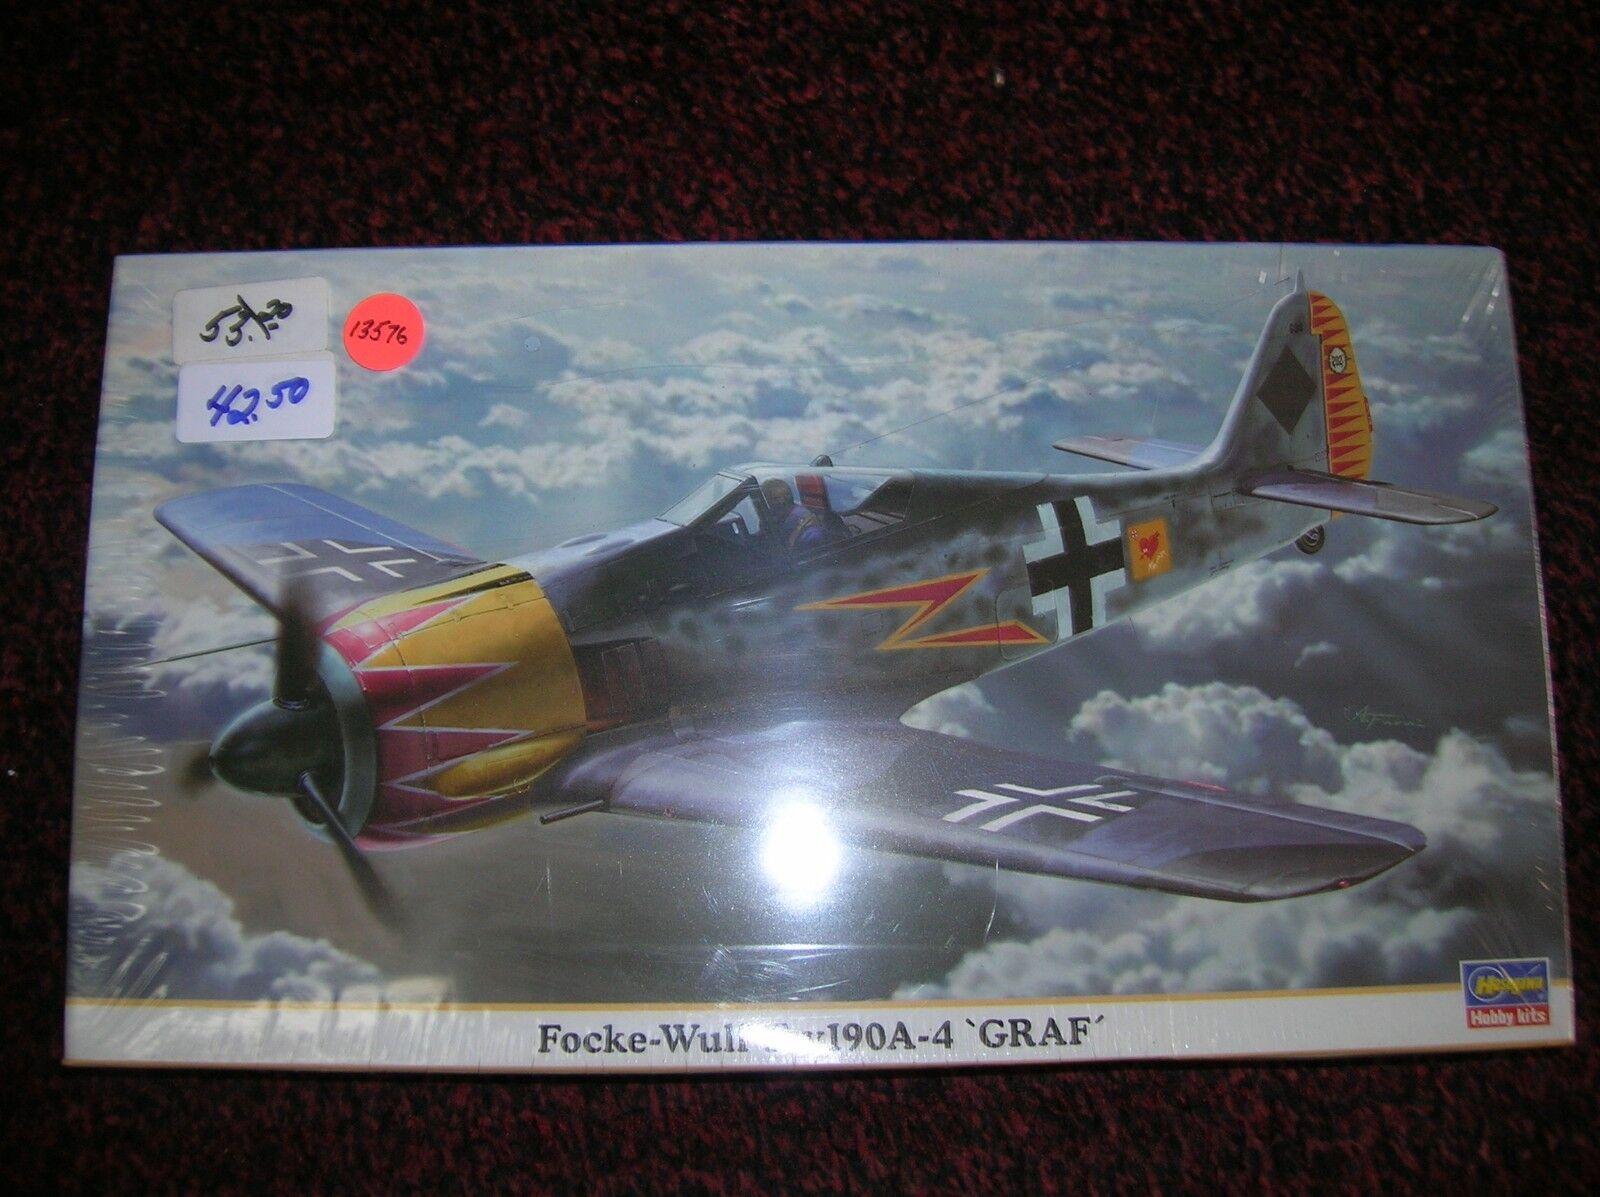 HASEGAWA   FW 190 A-4  GRAF   GERMAN    1 48 LIST   53.00 LOT